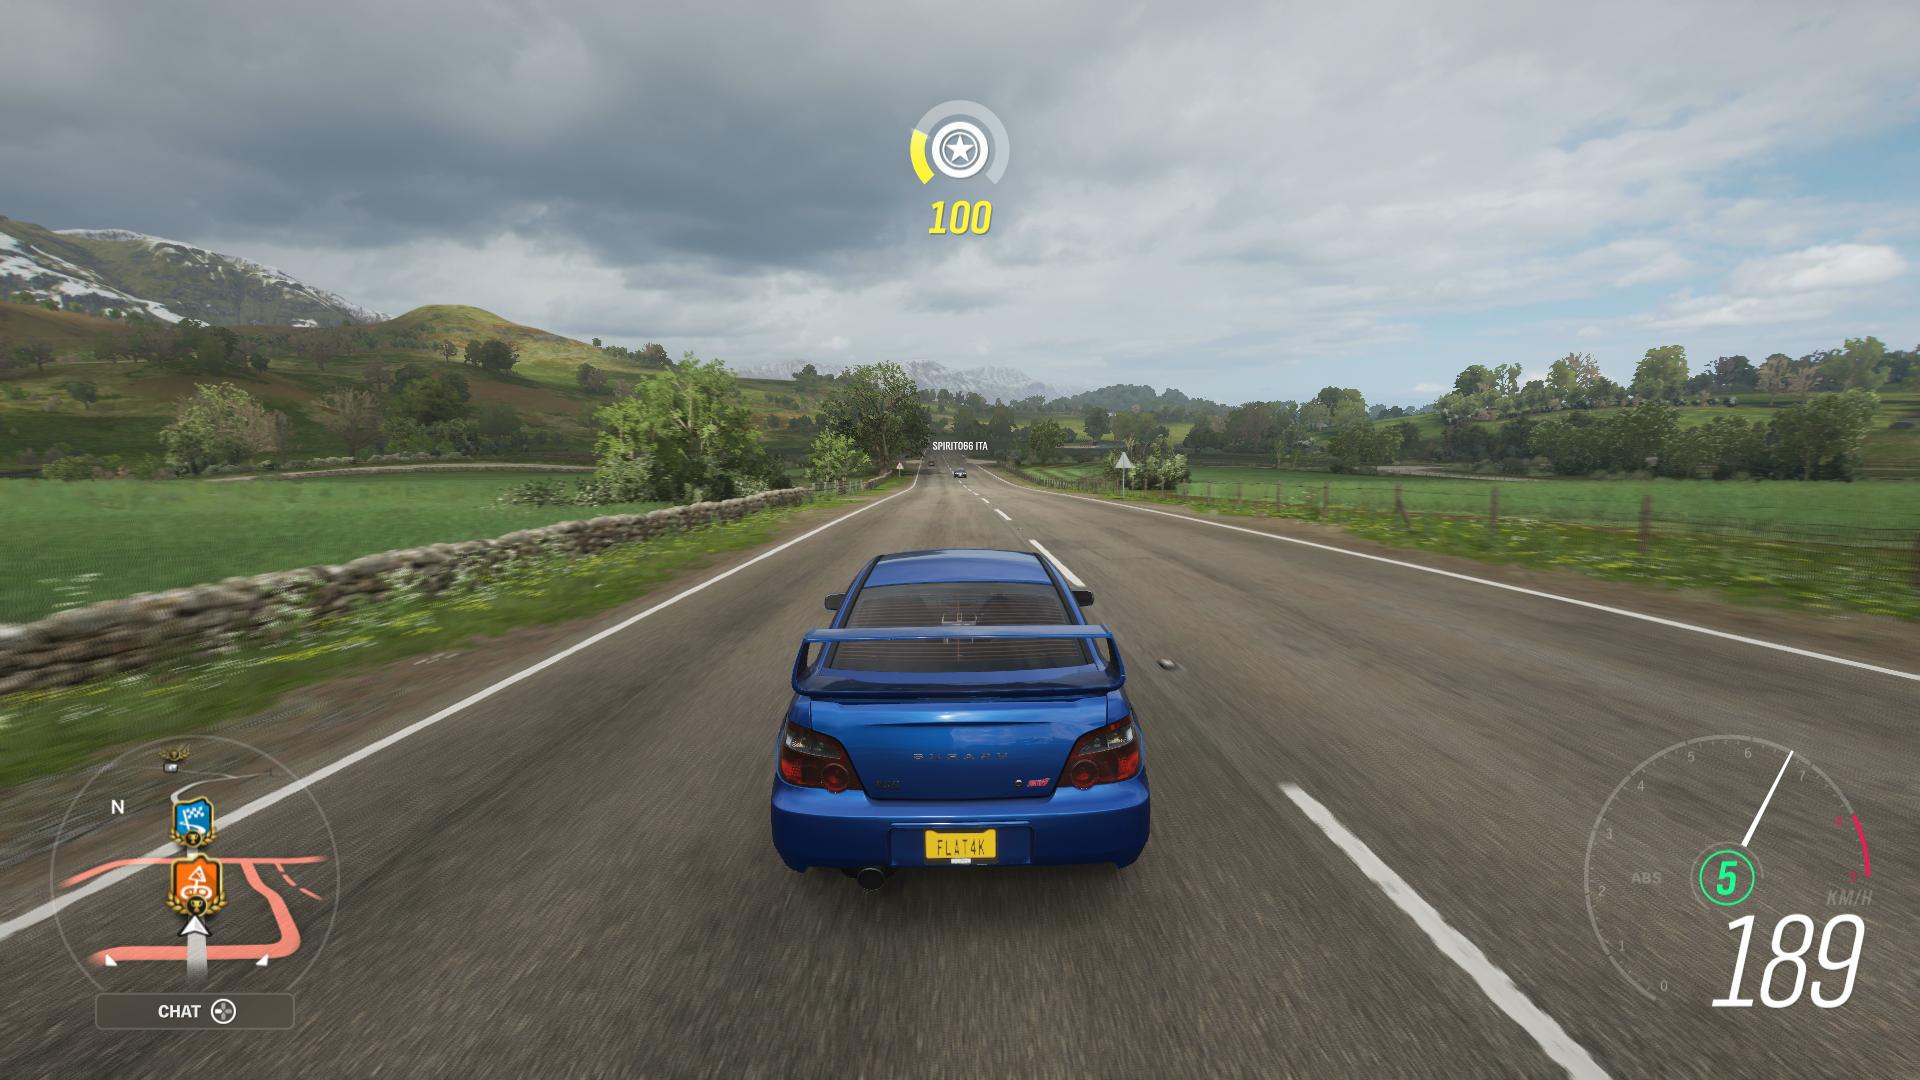 Xbox Series S screenshot of Forza Horizon 4 with a Subaru driving through the countryside